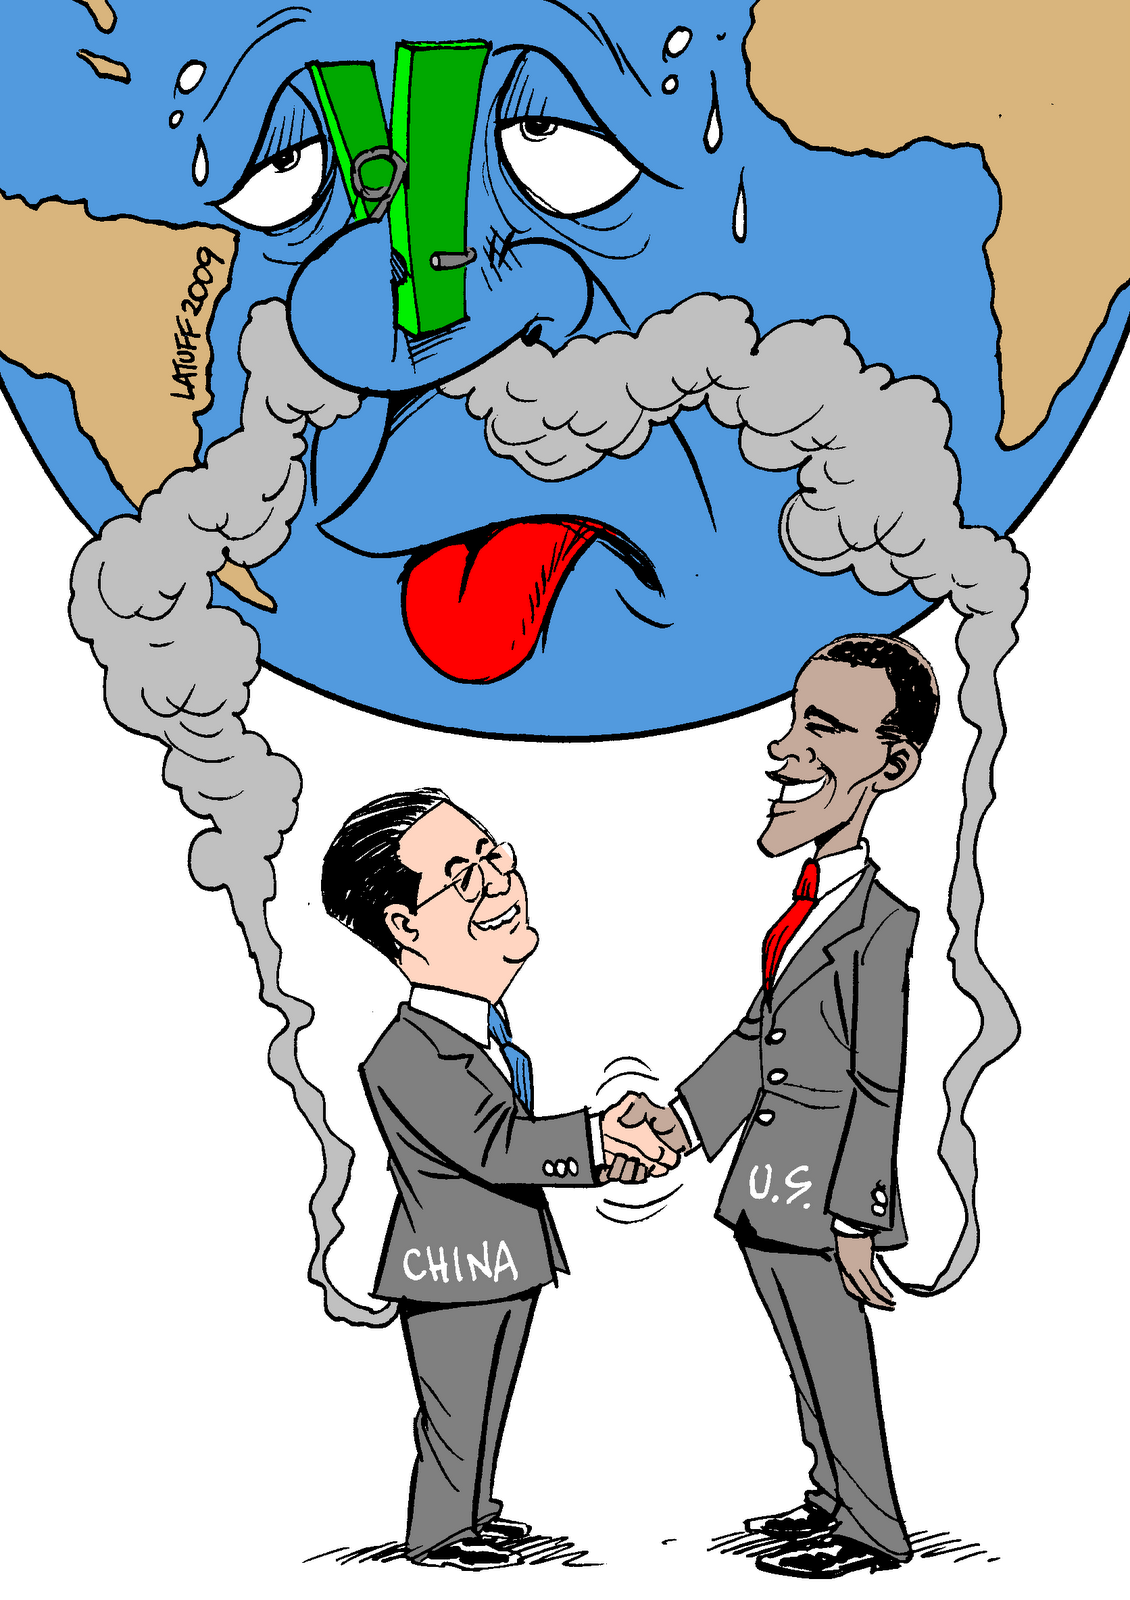 © Latuff 2009